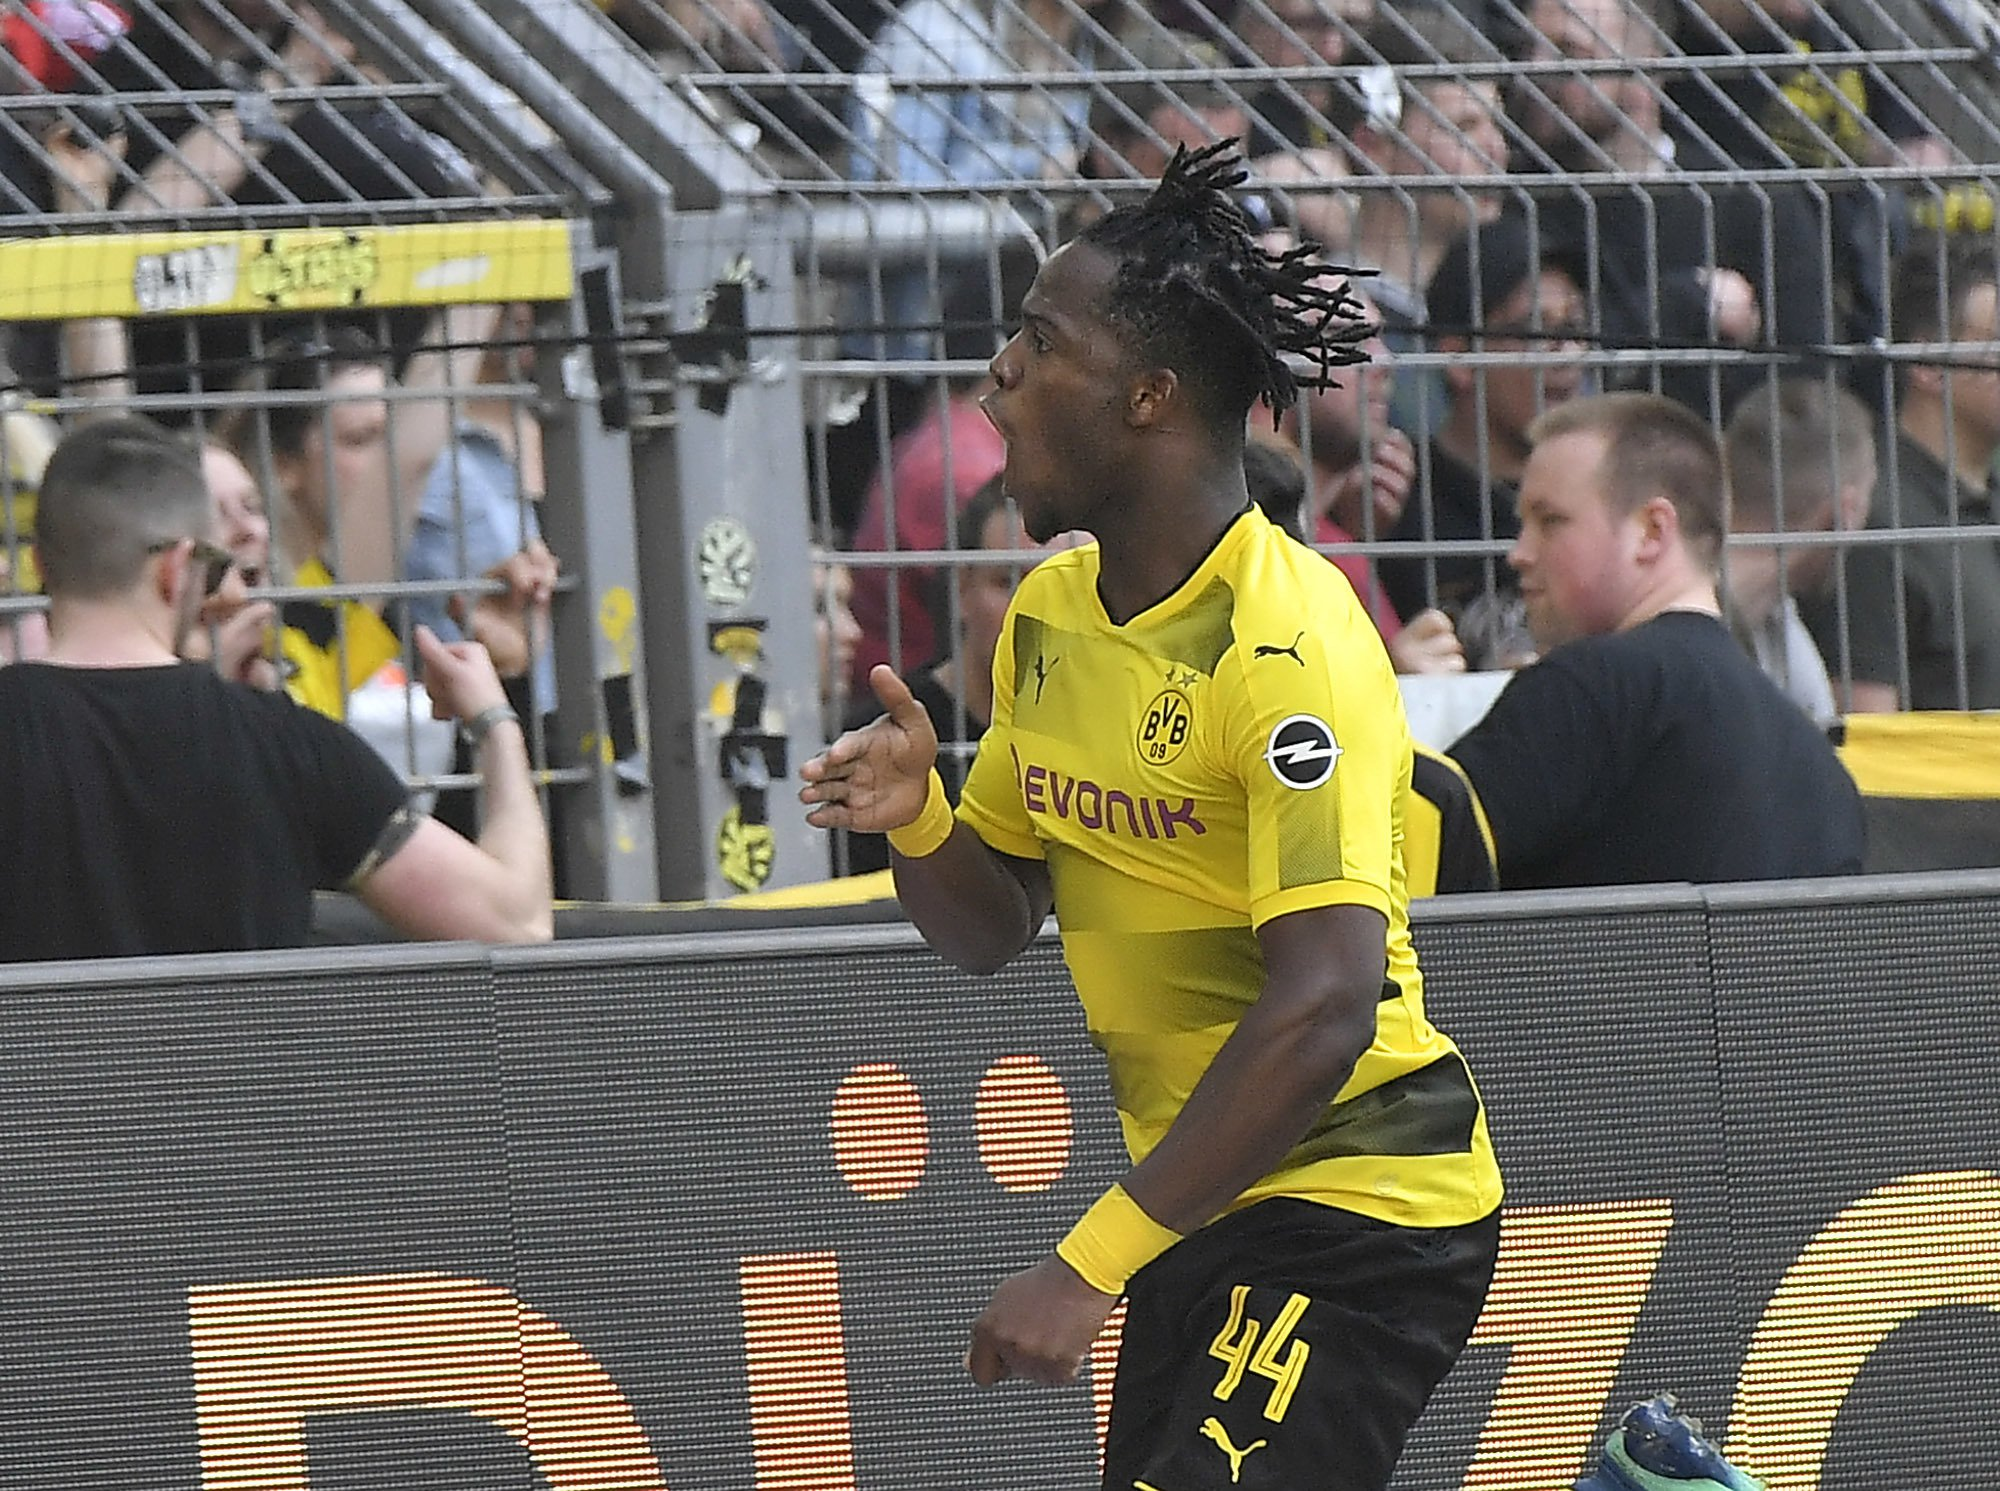 Chelsea loanee Michy Batshuayi shows off insane skill as he scores again for Dortmund